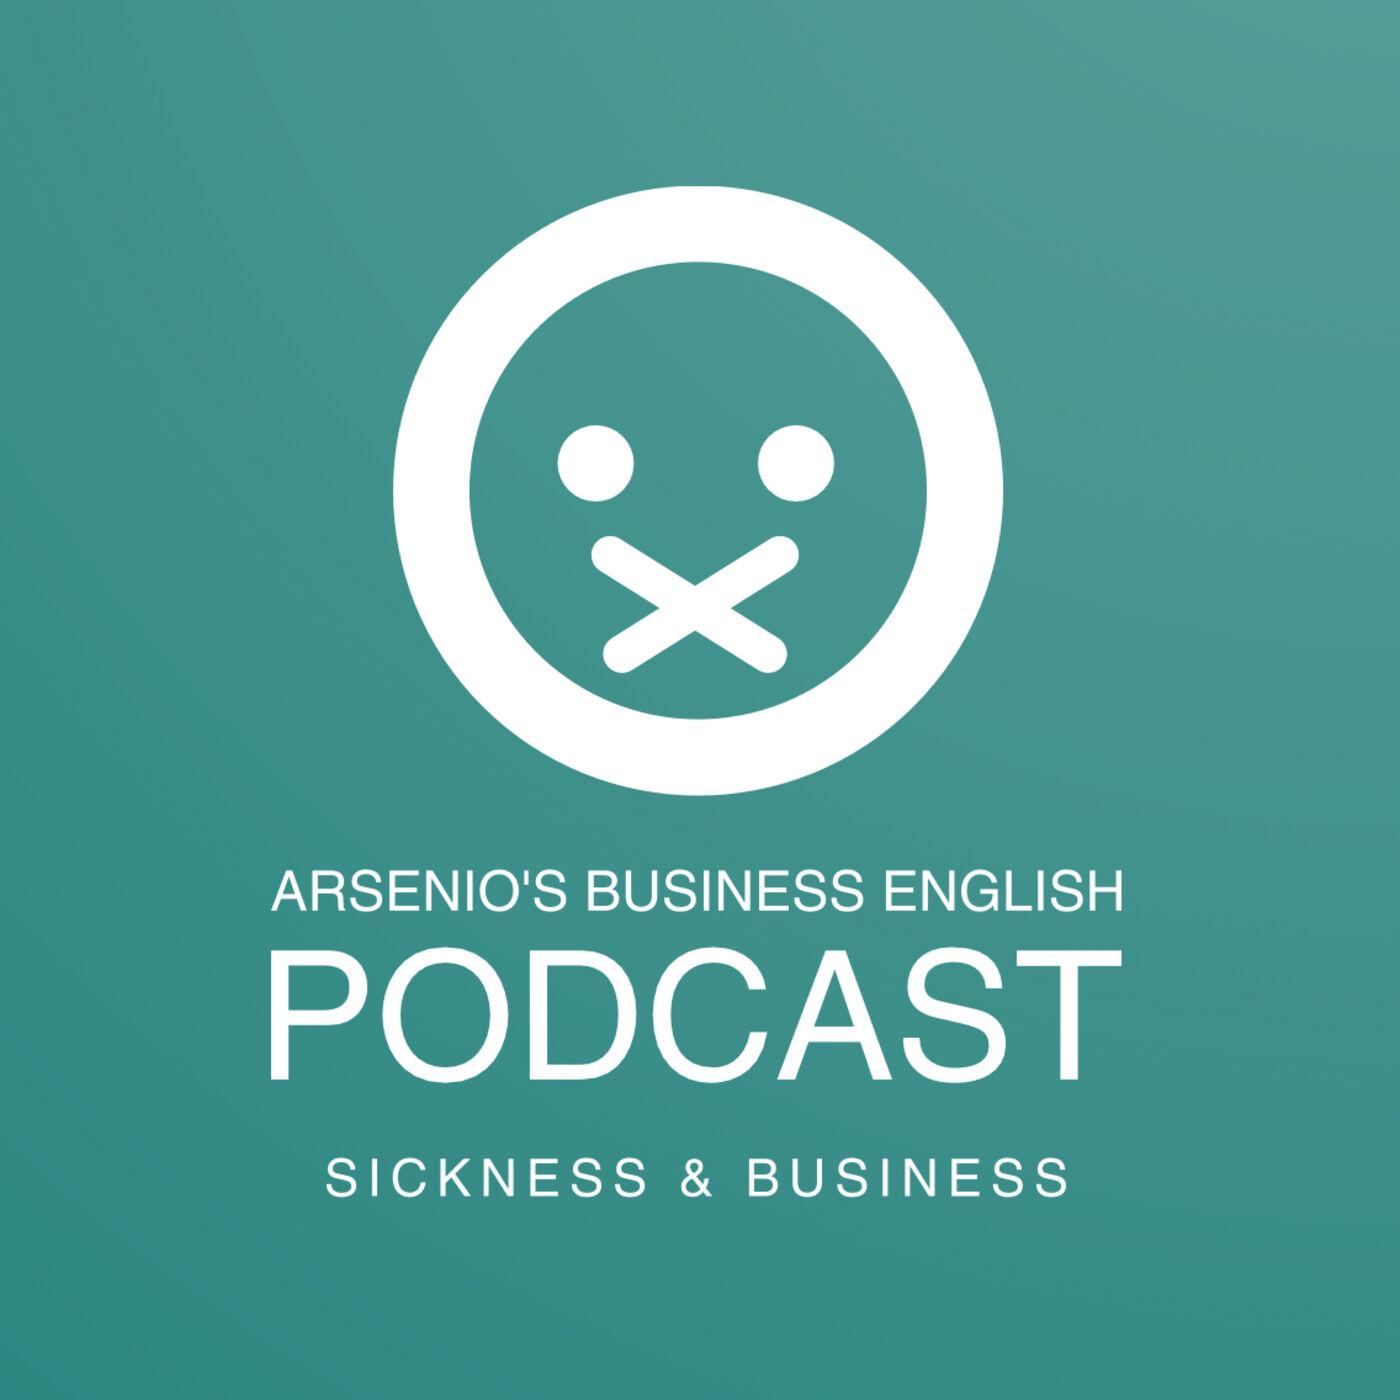 Arsenio's Business English Podcast | Season 6: Episode 30 | Sickness & Business